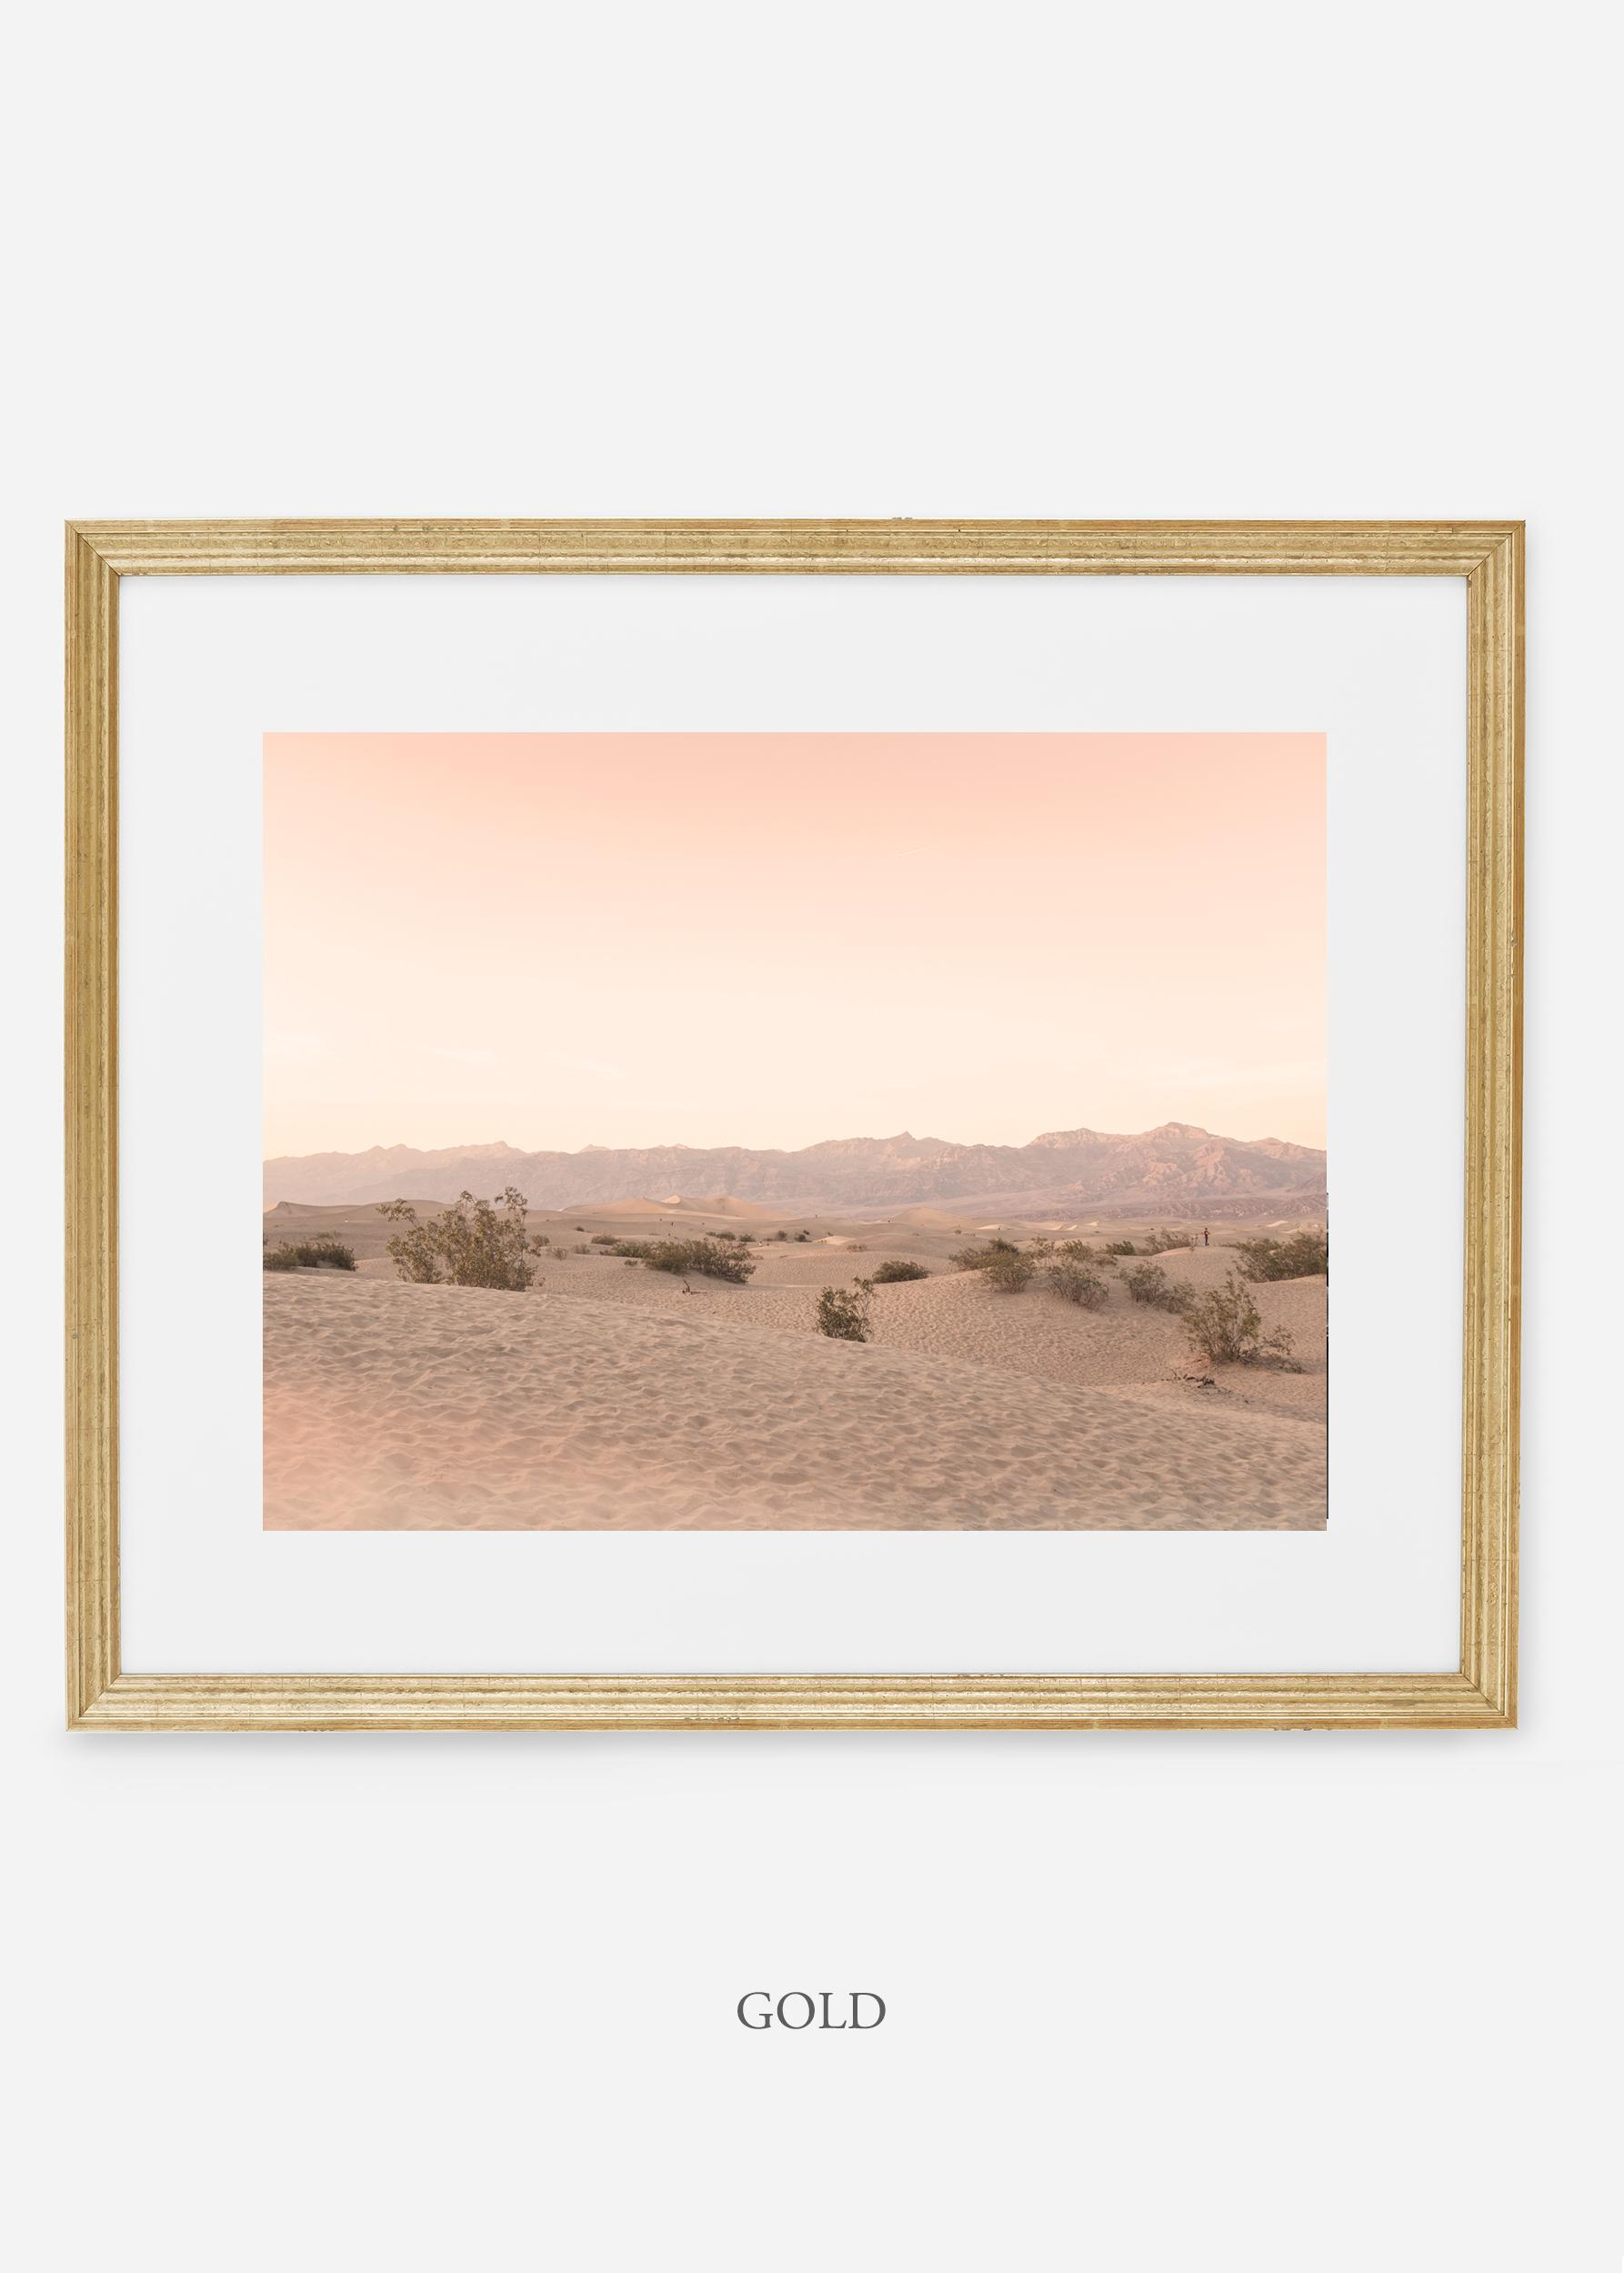 wildercalifornia_goldframe_deathvalley_4_minimal_cactus_art_interiordesign_blackandwhite.jpg